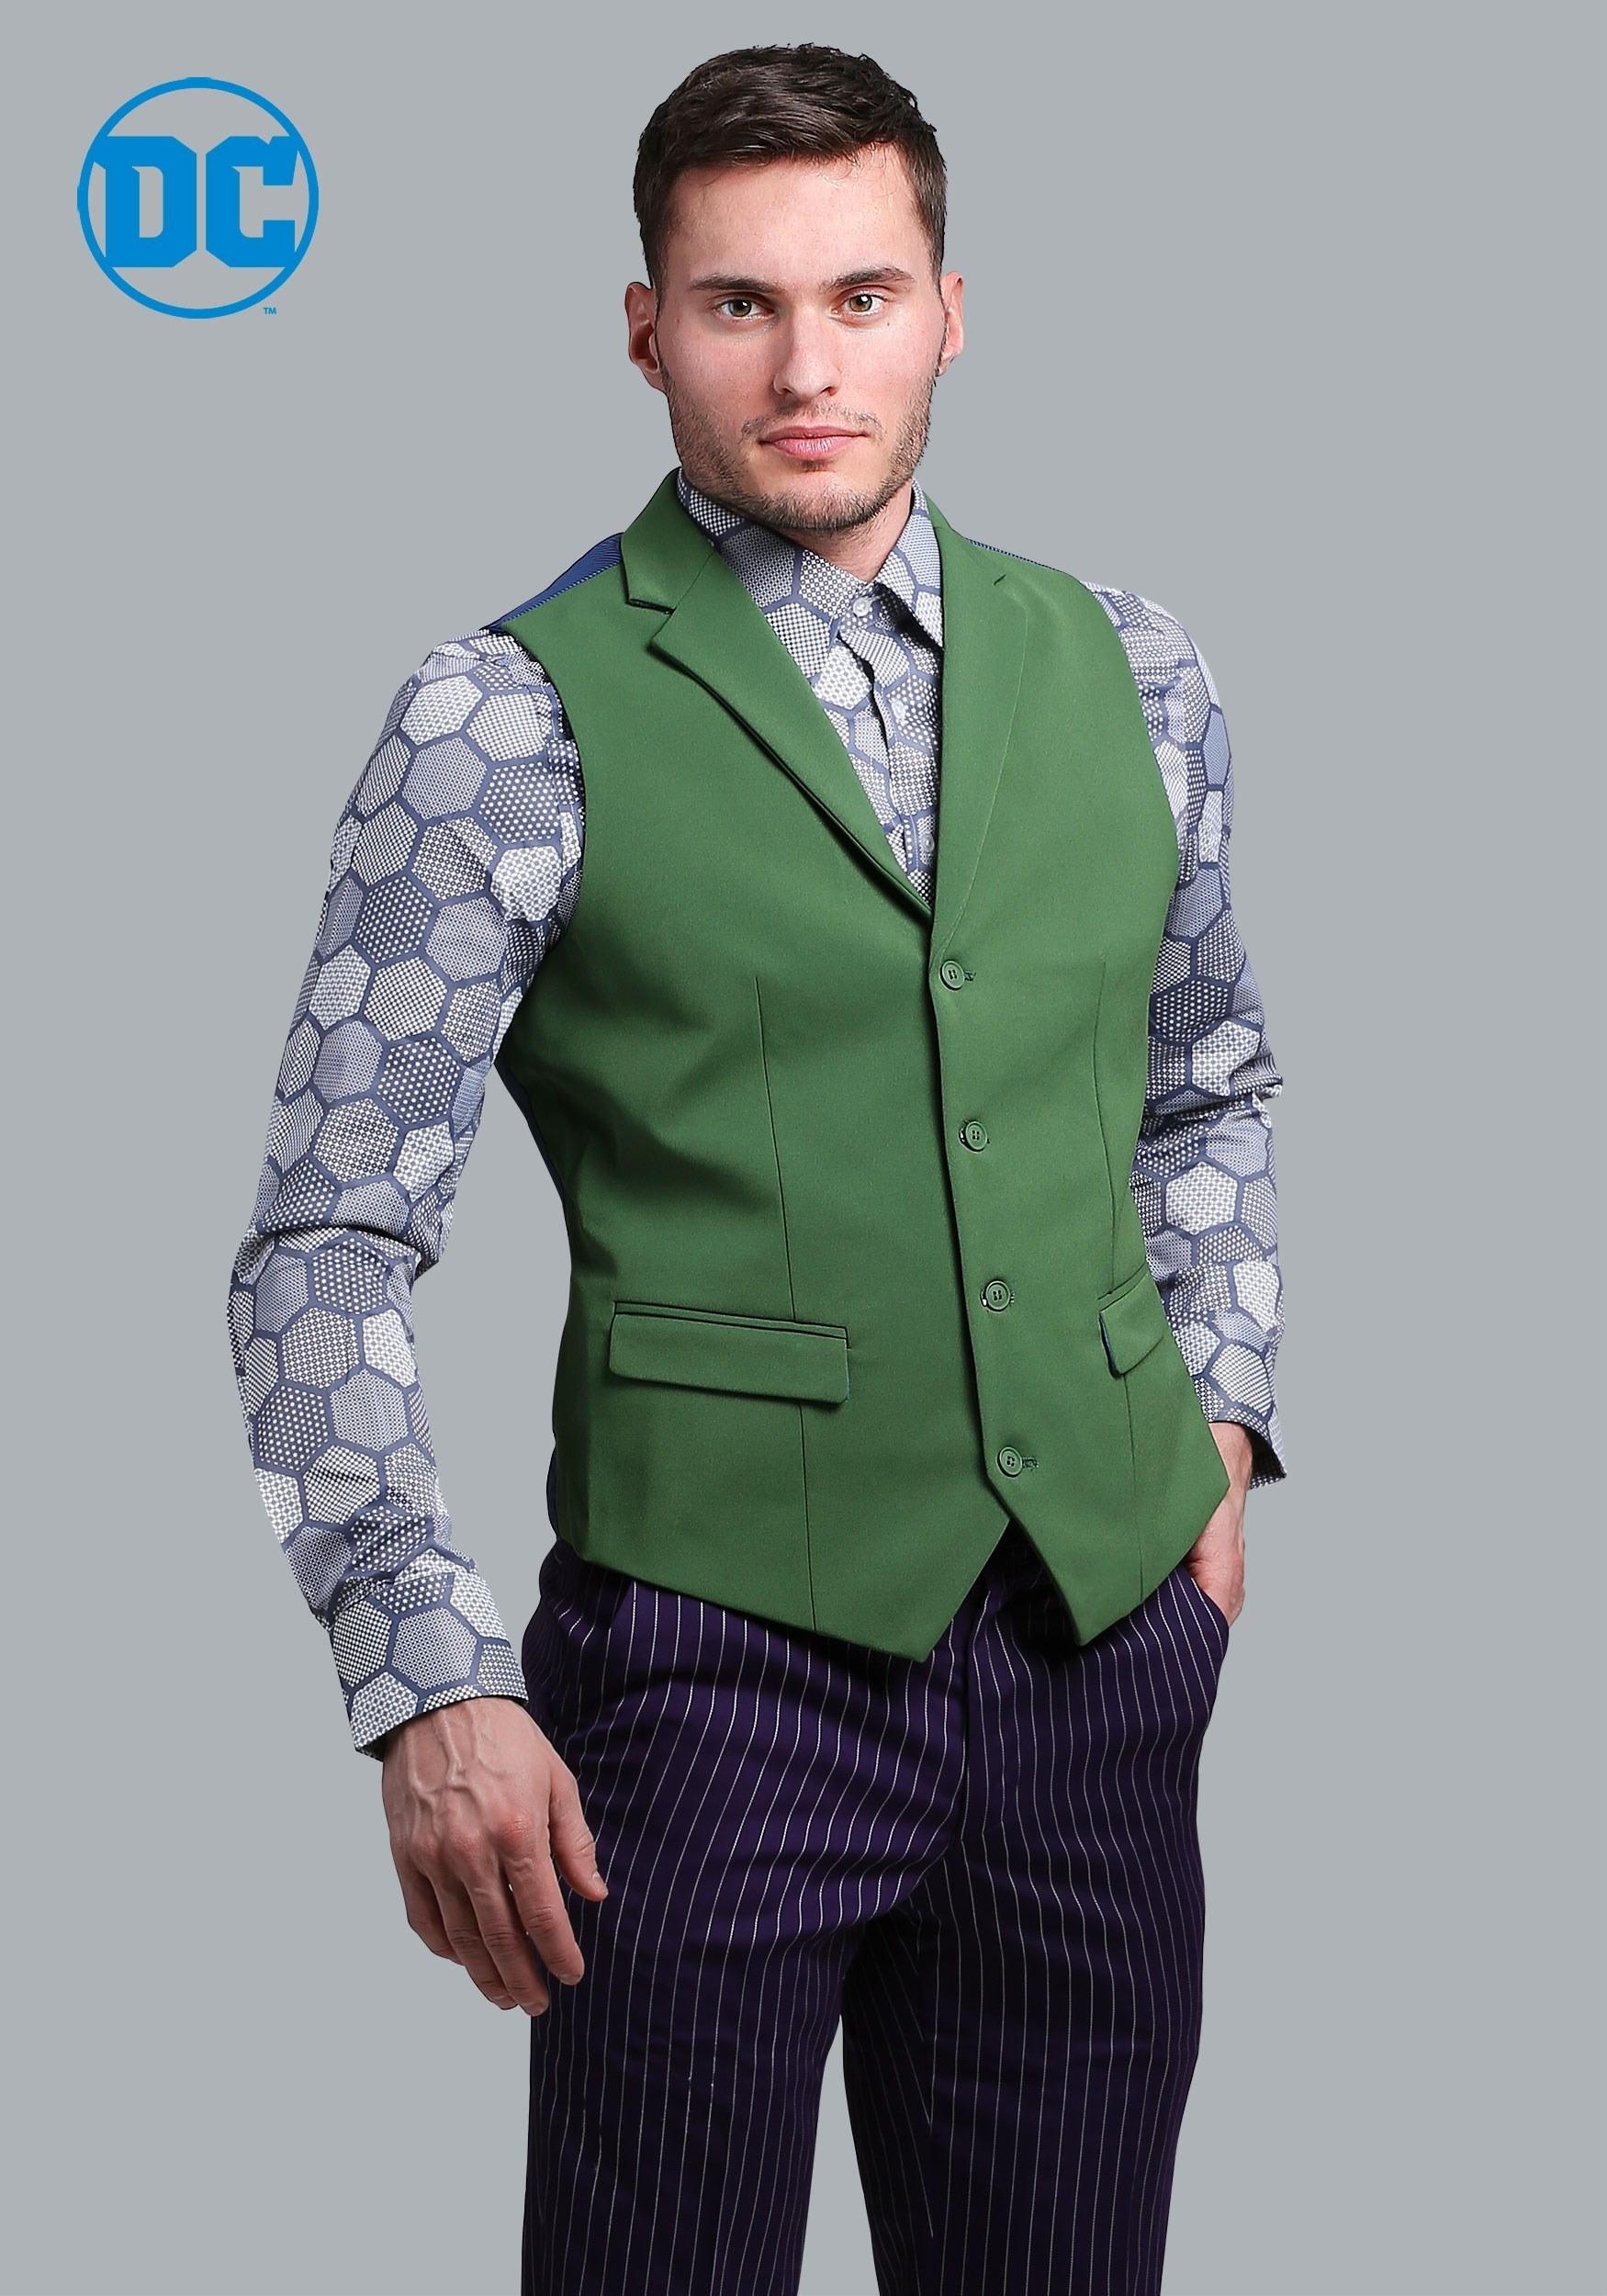 The Joker Suit Vest (Authentic)  sc 1 st  Halloween Costumes & High Quality Elite Costumes - HalloweenCostumes.com